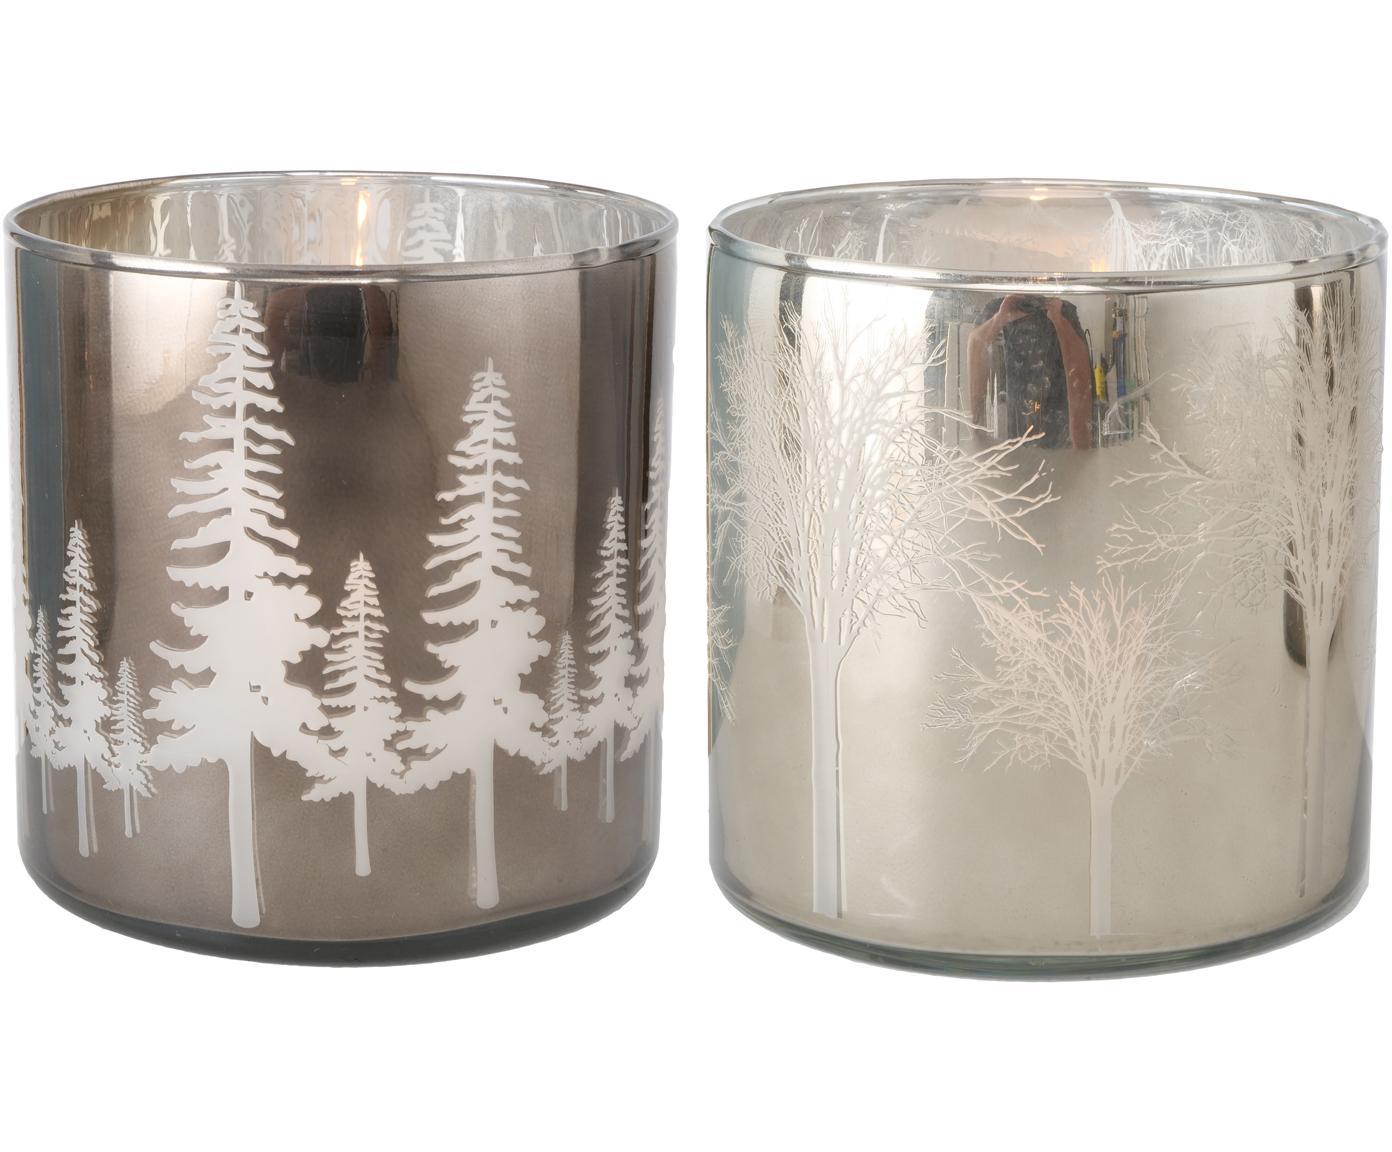 Set 2 portacandele Skove, Vetro verniciato, Argento, grigio, lucido, Ø 15 x Alt. 15 cm